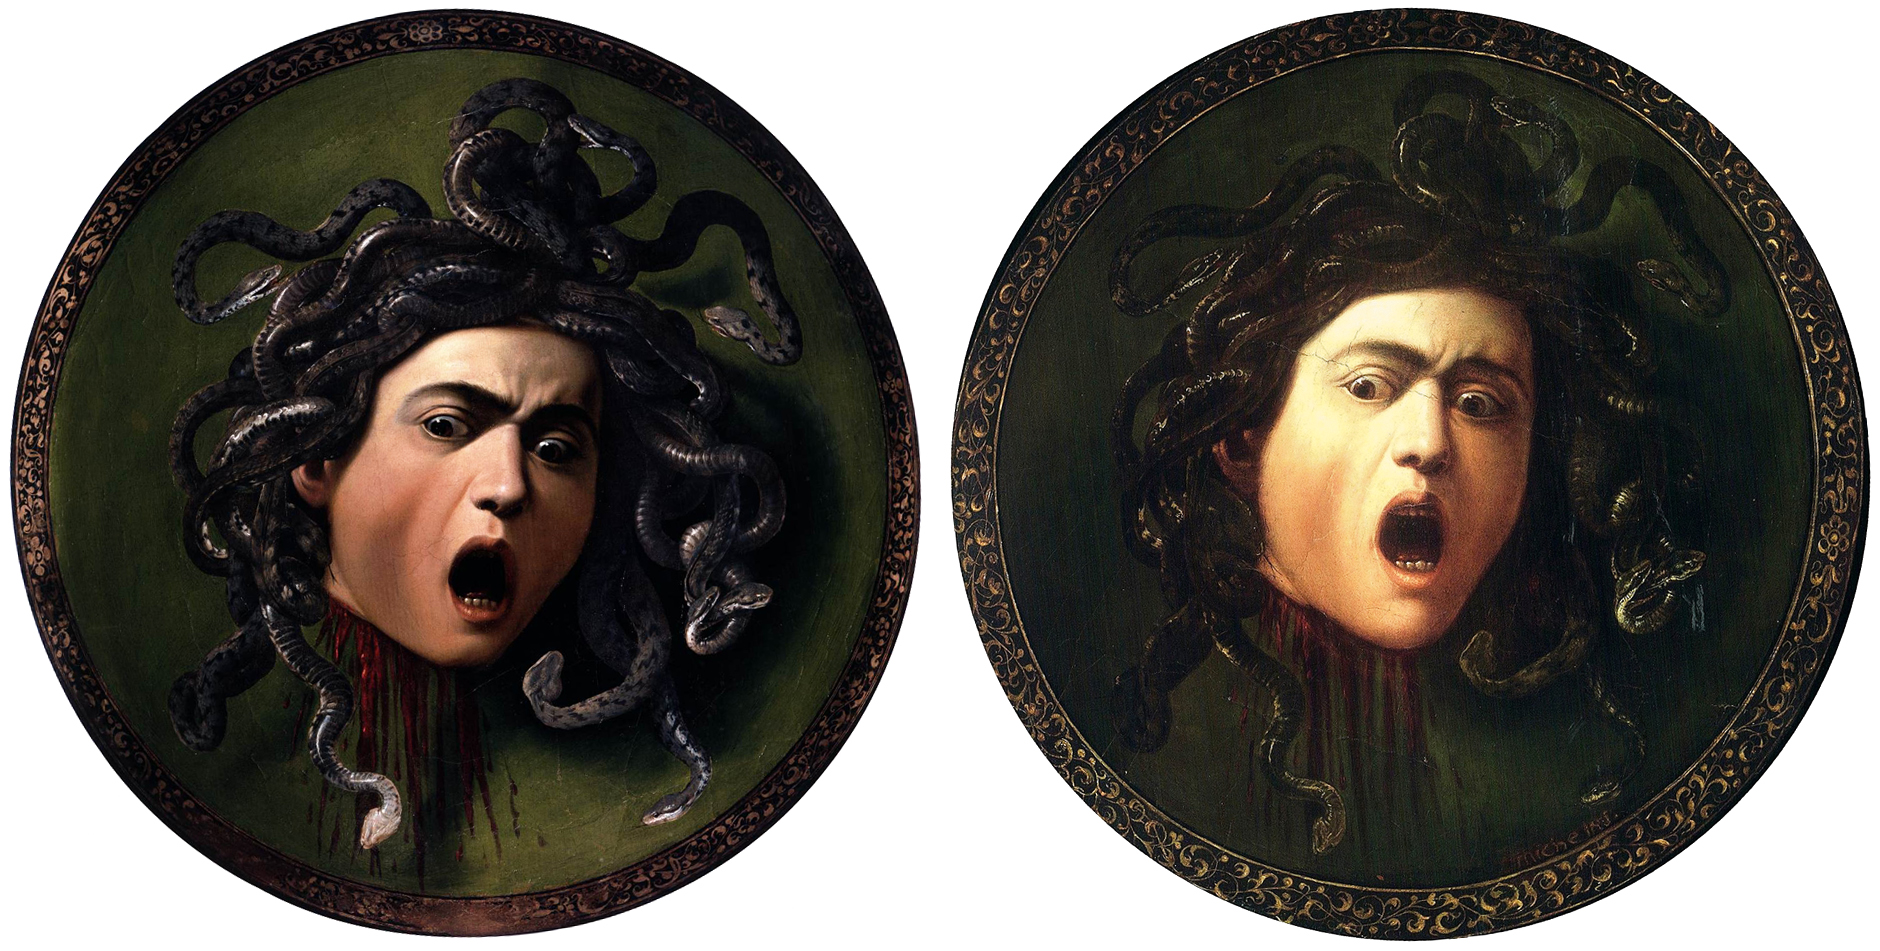 Caravaggio-Meduse-Medusa-insight-coaching-art, colère, hatred, anger